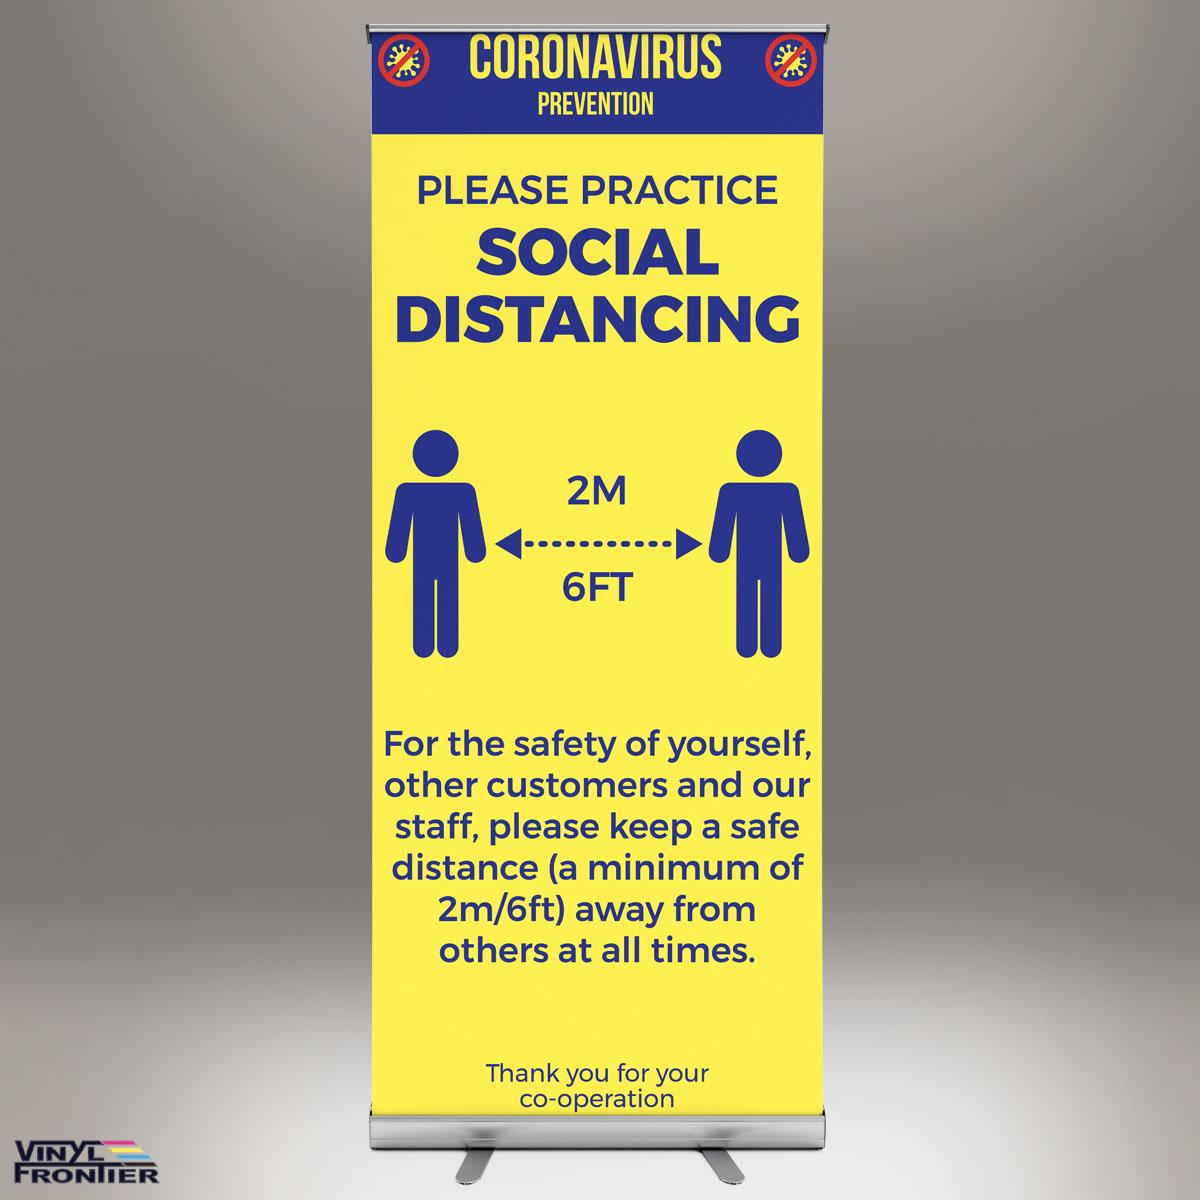 Social Distancing Roll Up Banner Vinyl Frontier